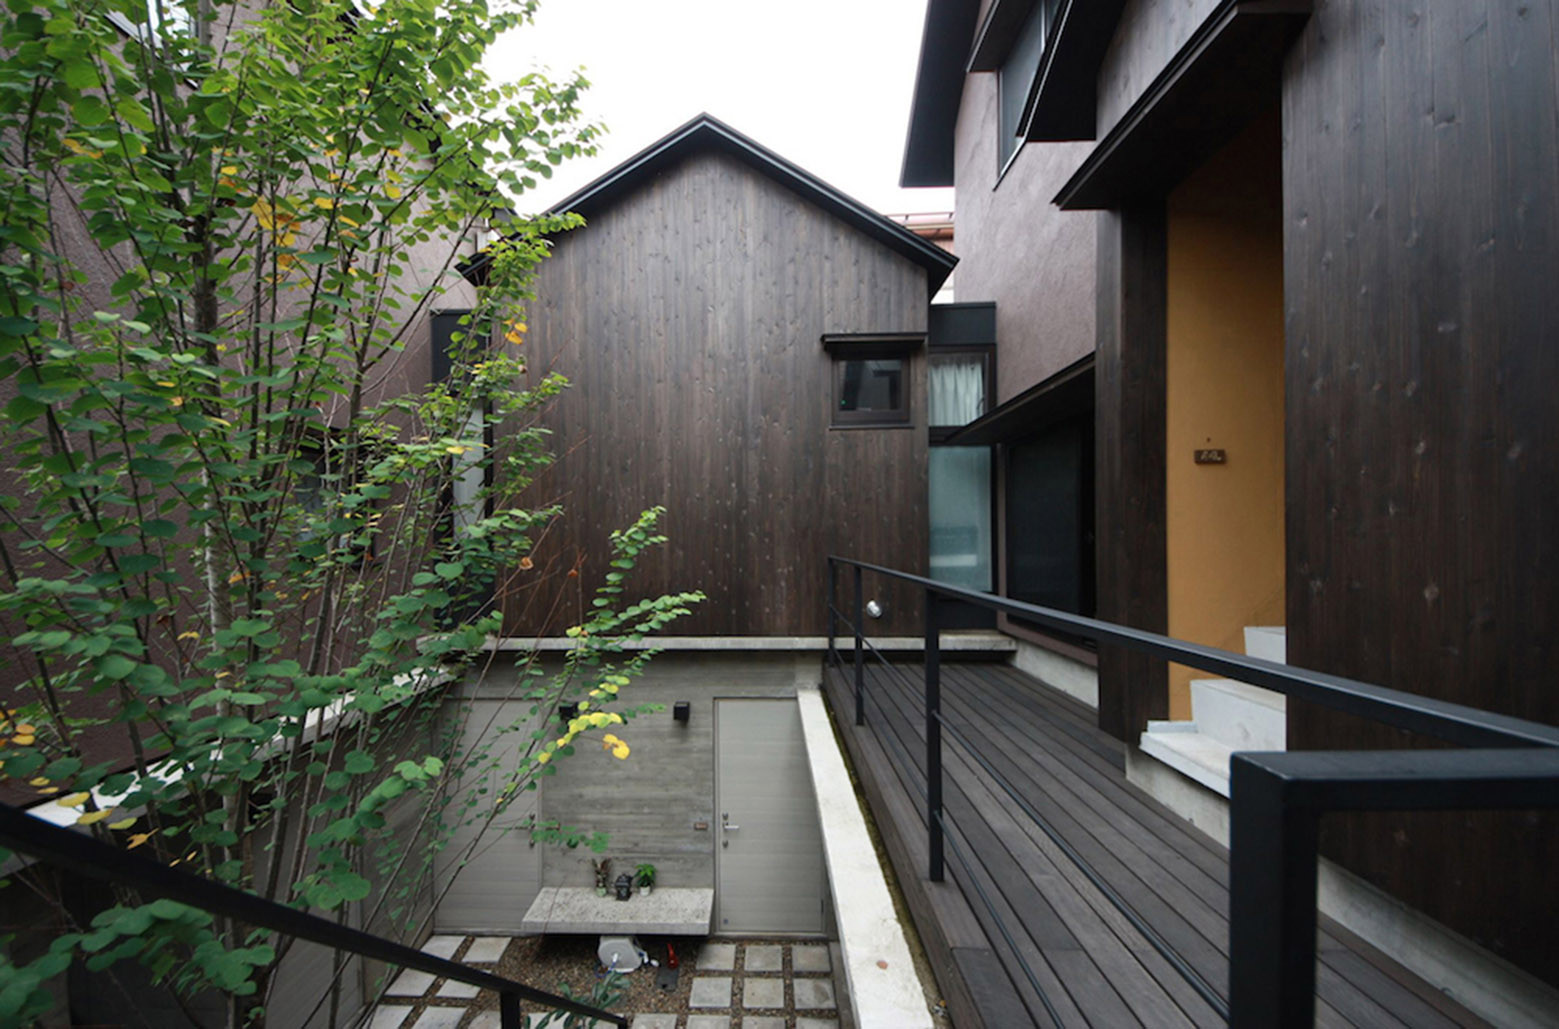 ISANA / Niko Design Studio, © Taketo Nishikubo